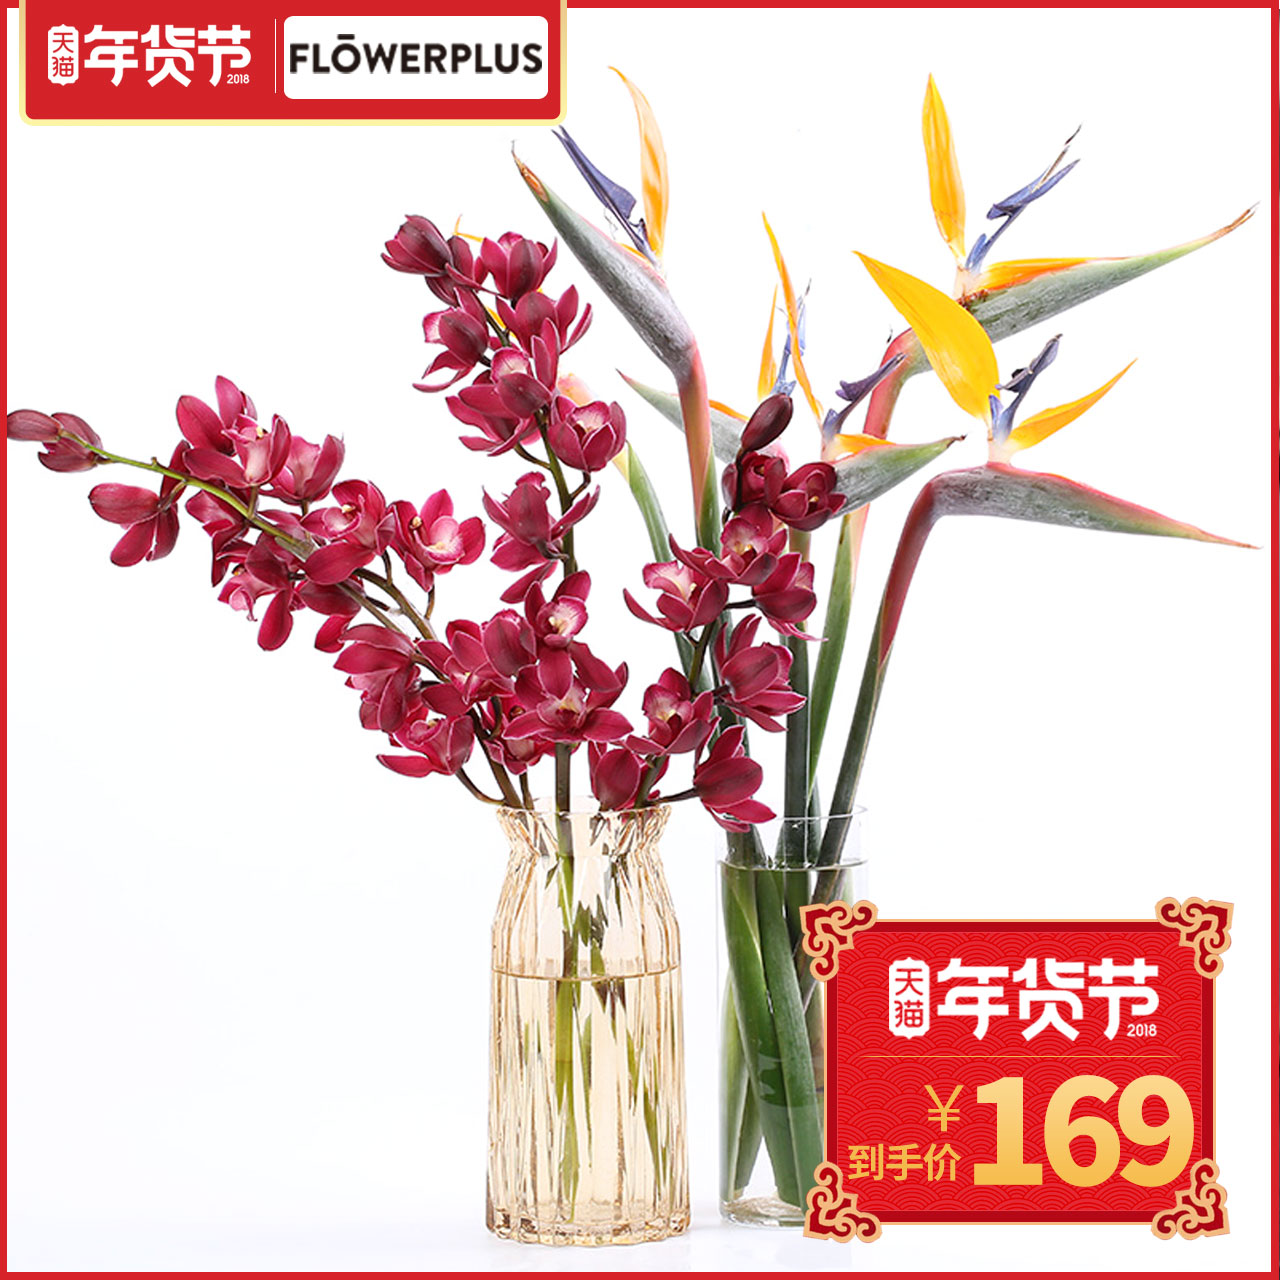 flowerplus新年福袋 天堂鸟大花蕙兰鲜花速递 情人节新年礼物包邮